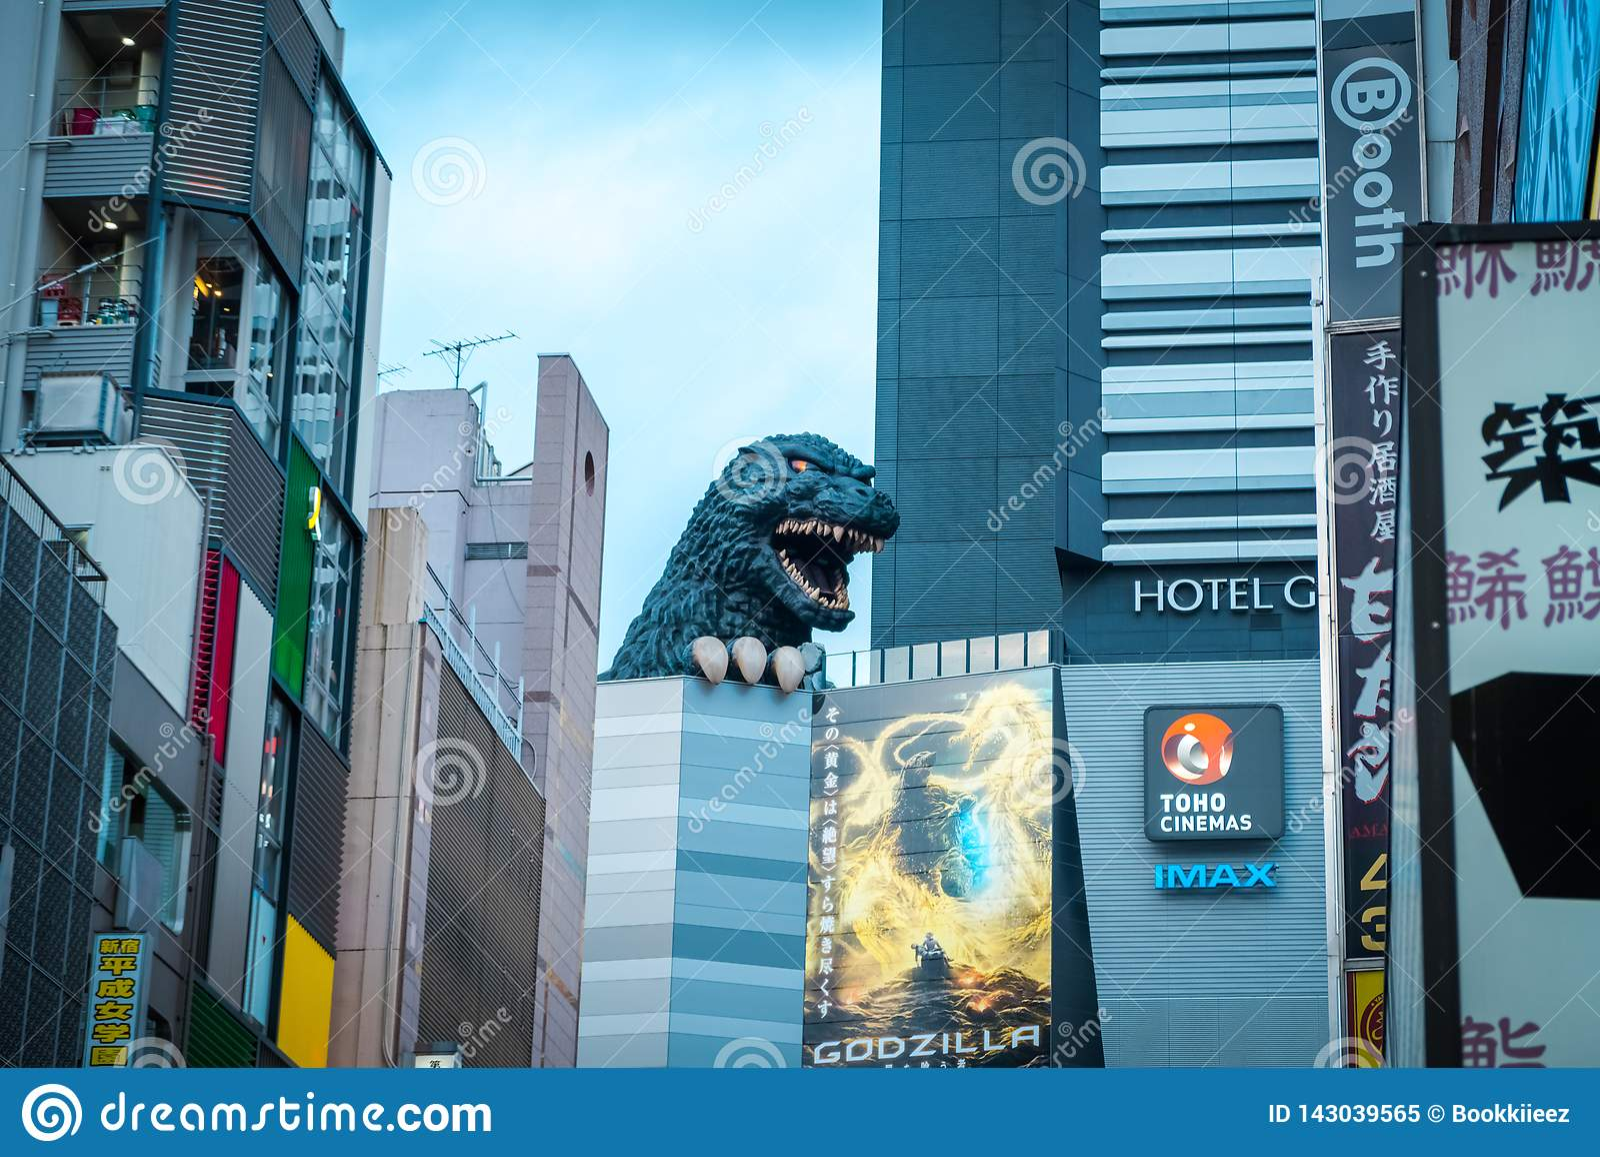 Godzilla στην οδό στην περιοχή Kabukicho, Shinjuku, Ιαπωνία